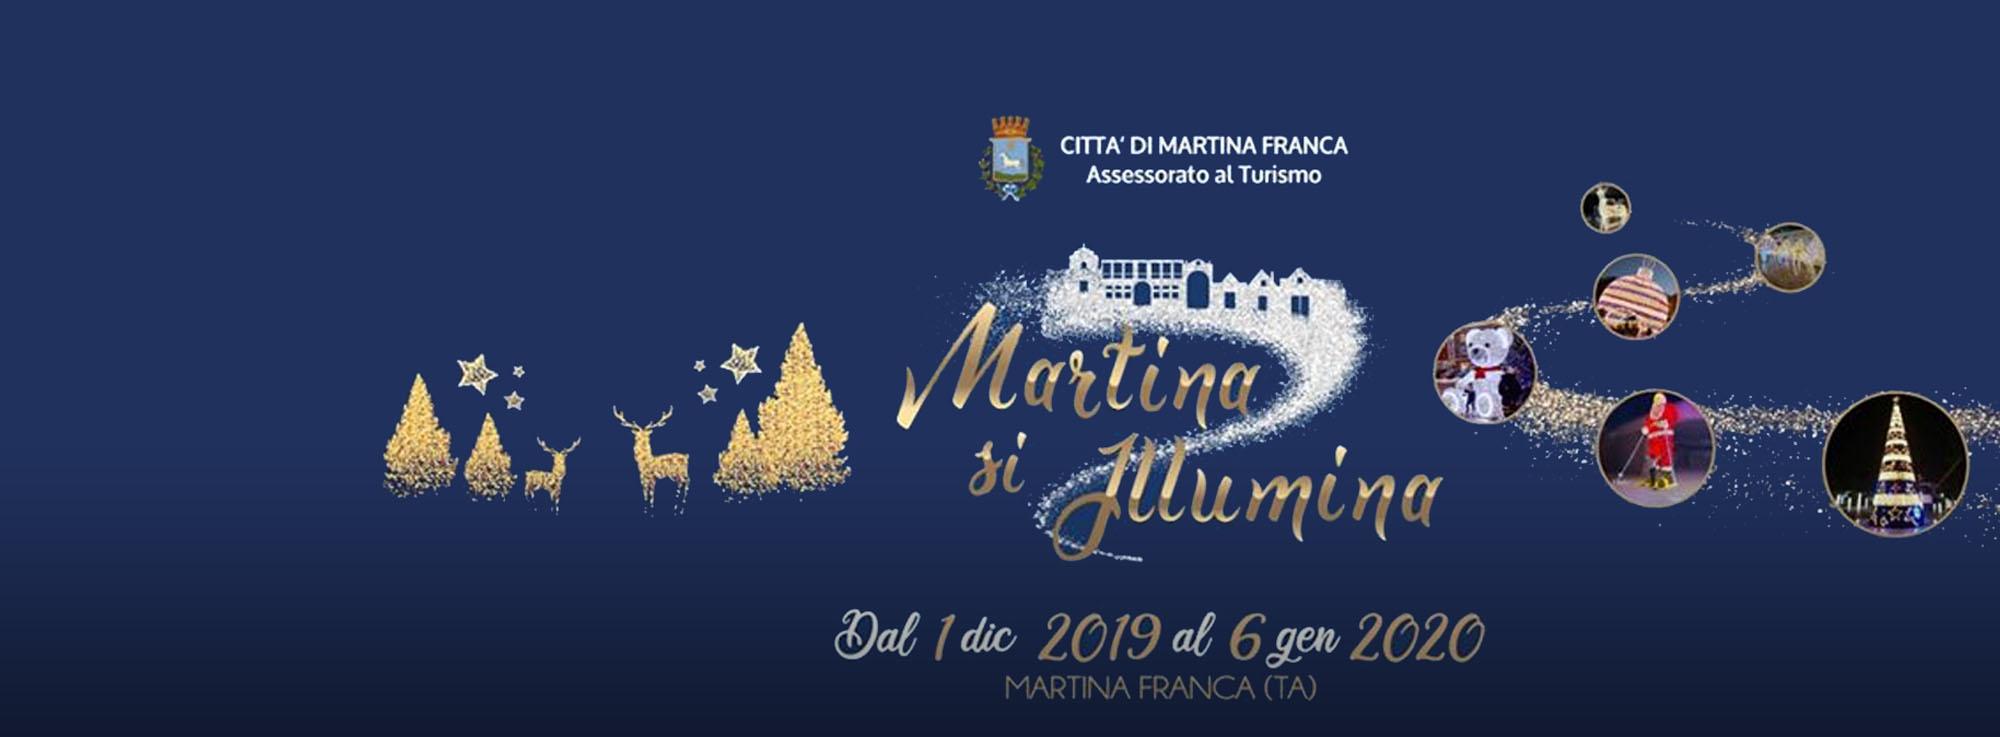 Martina Franca: Martina si illumina